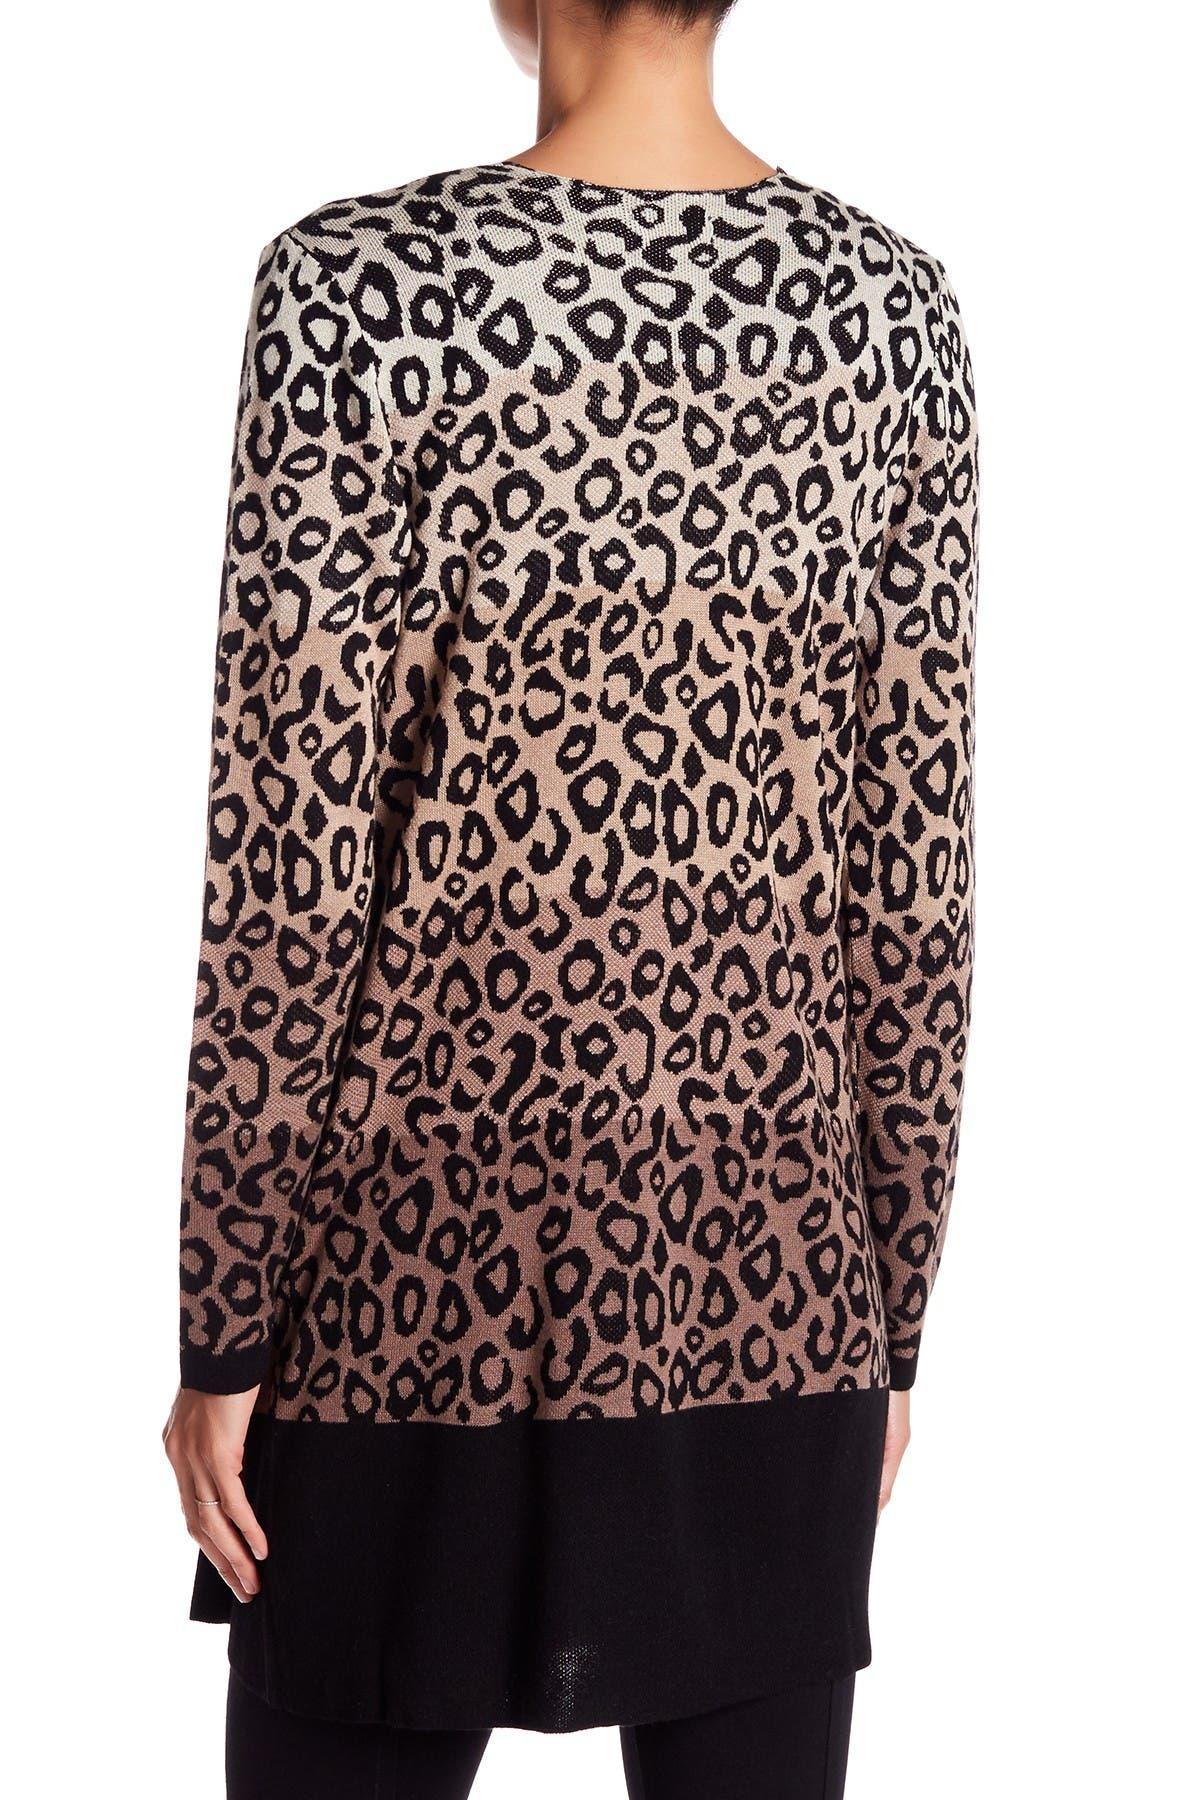 Image of JOSEPH A Leopard Print Double Knit Cardigan